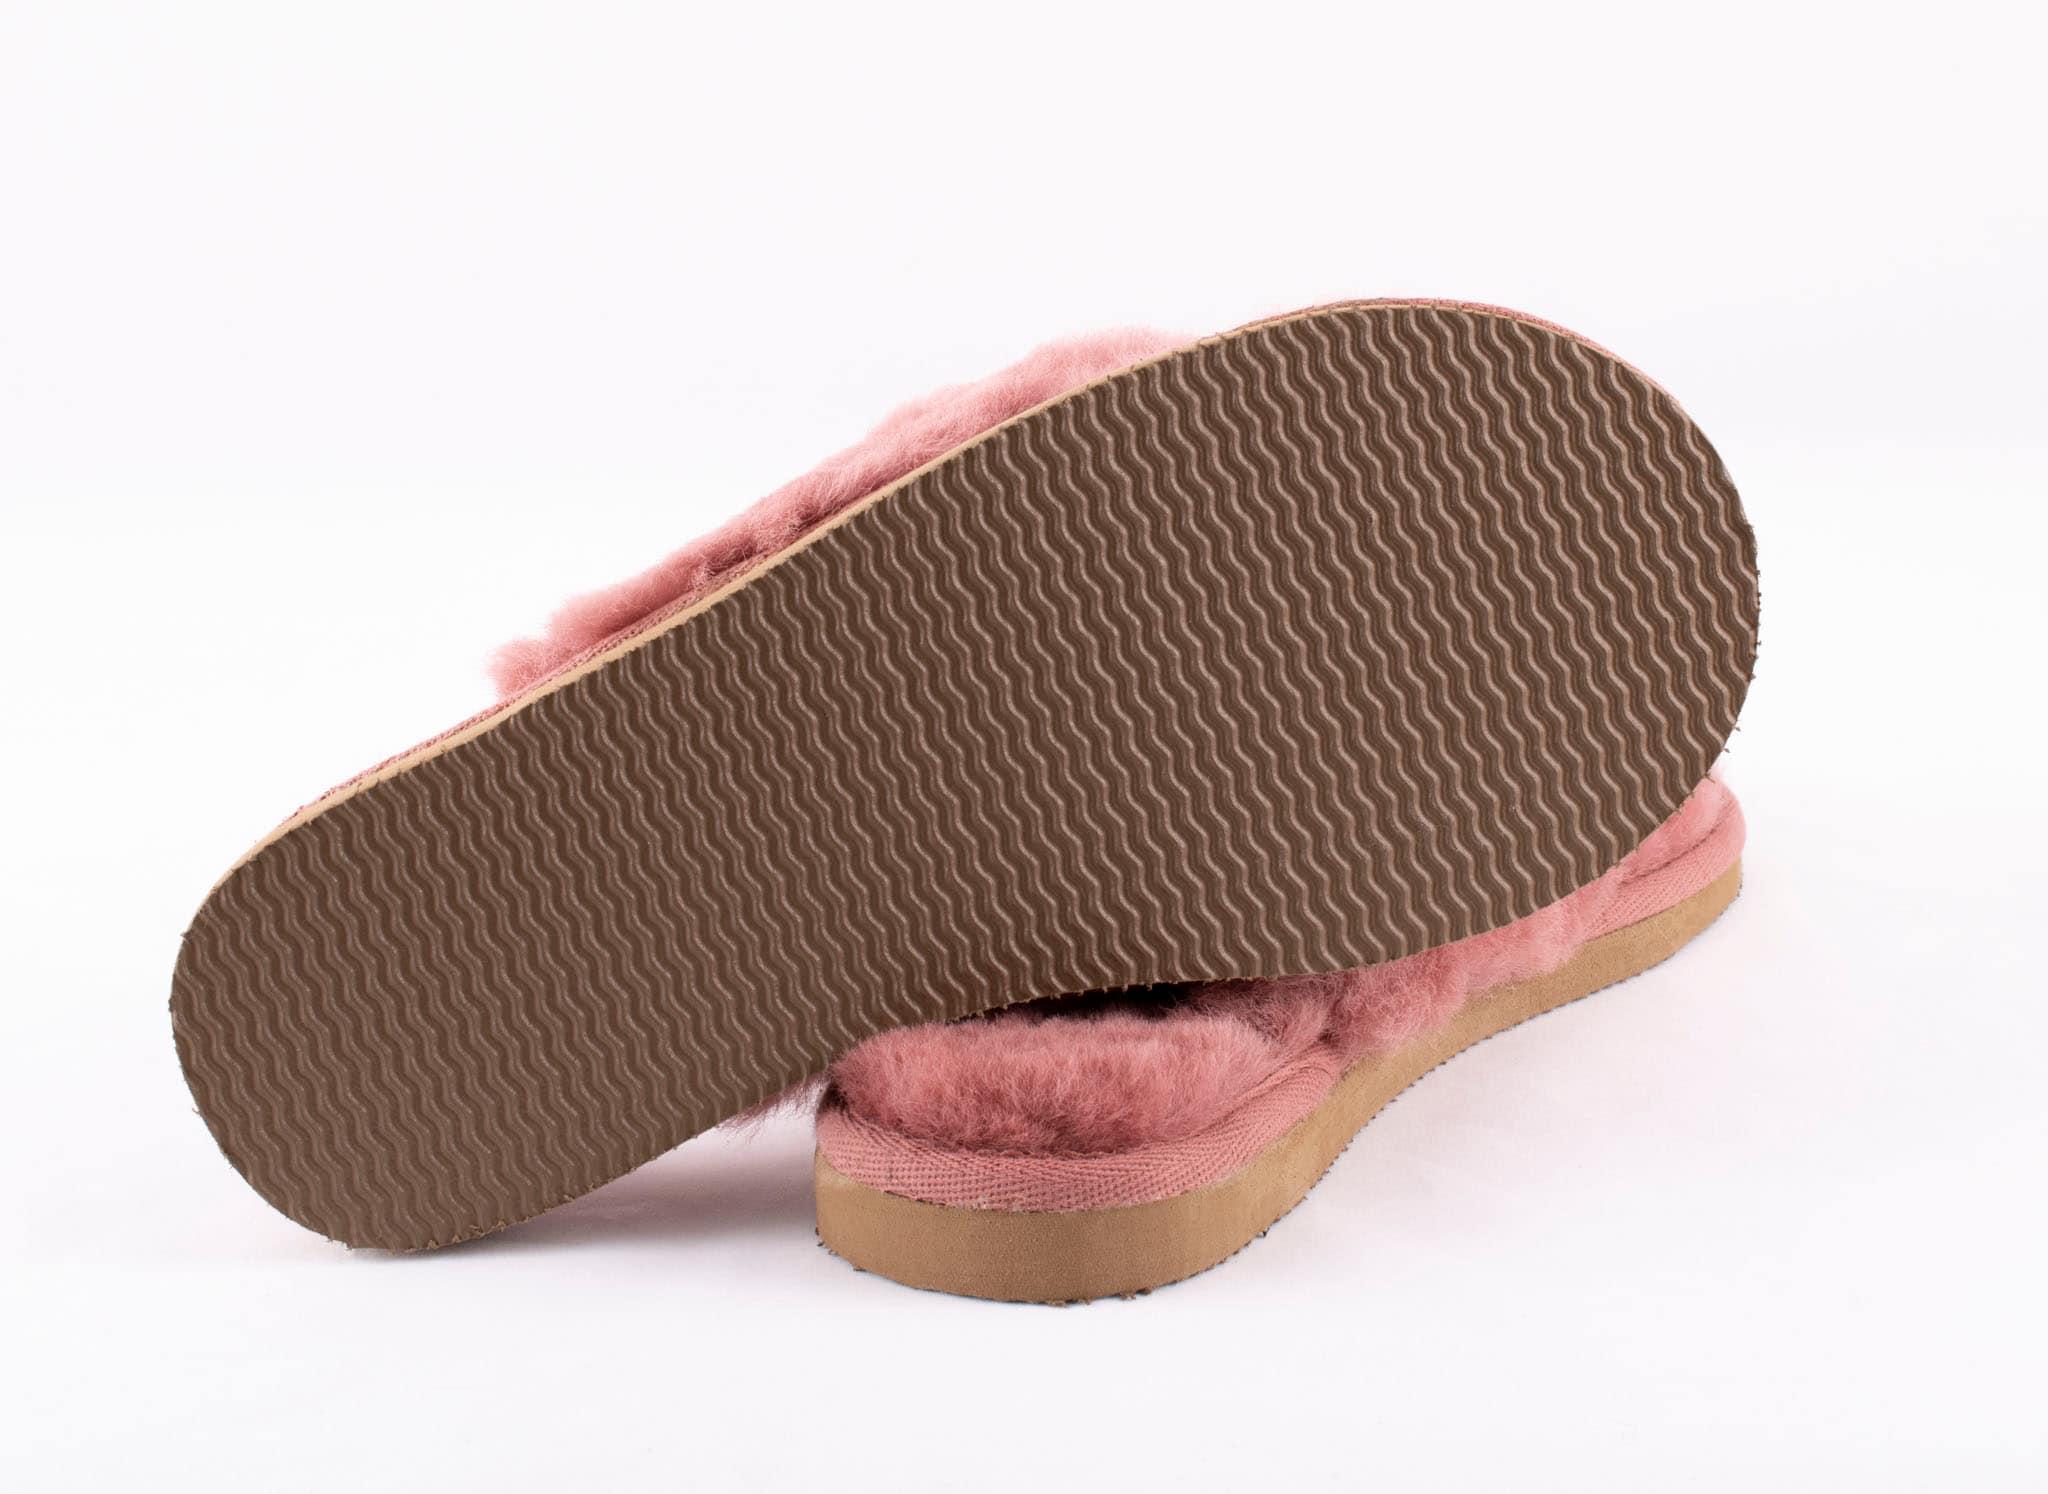 Pernilla sheepskin slippers